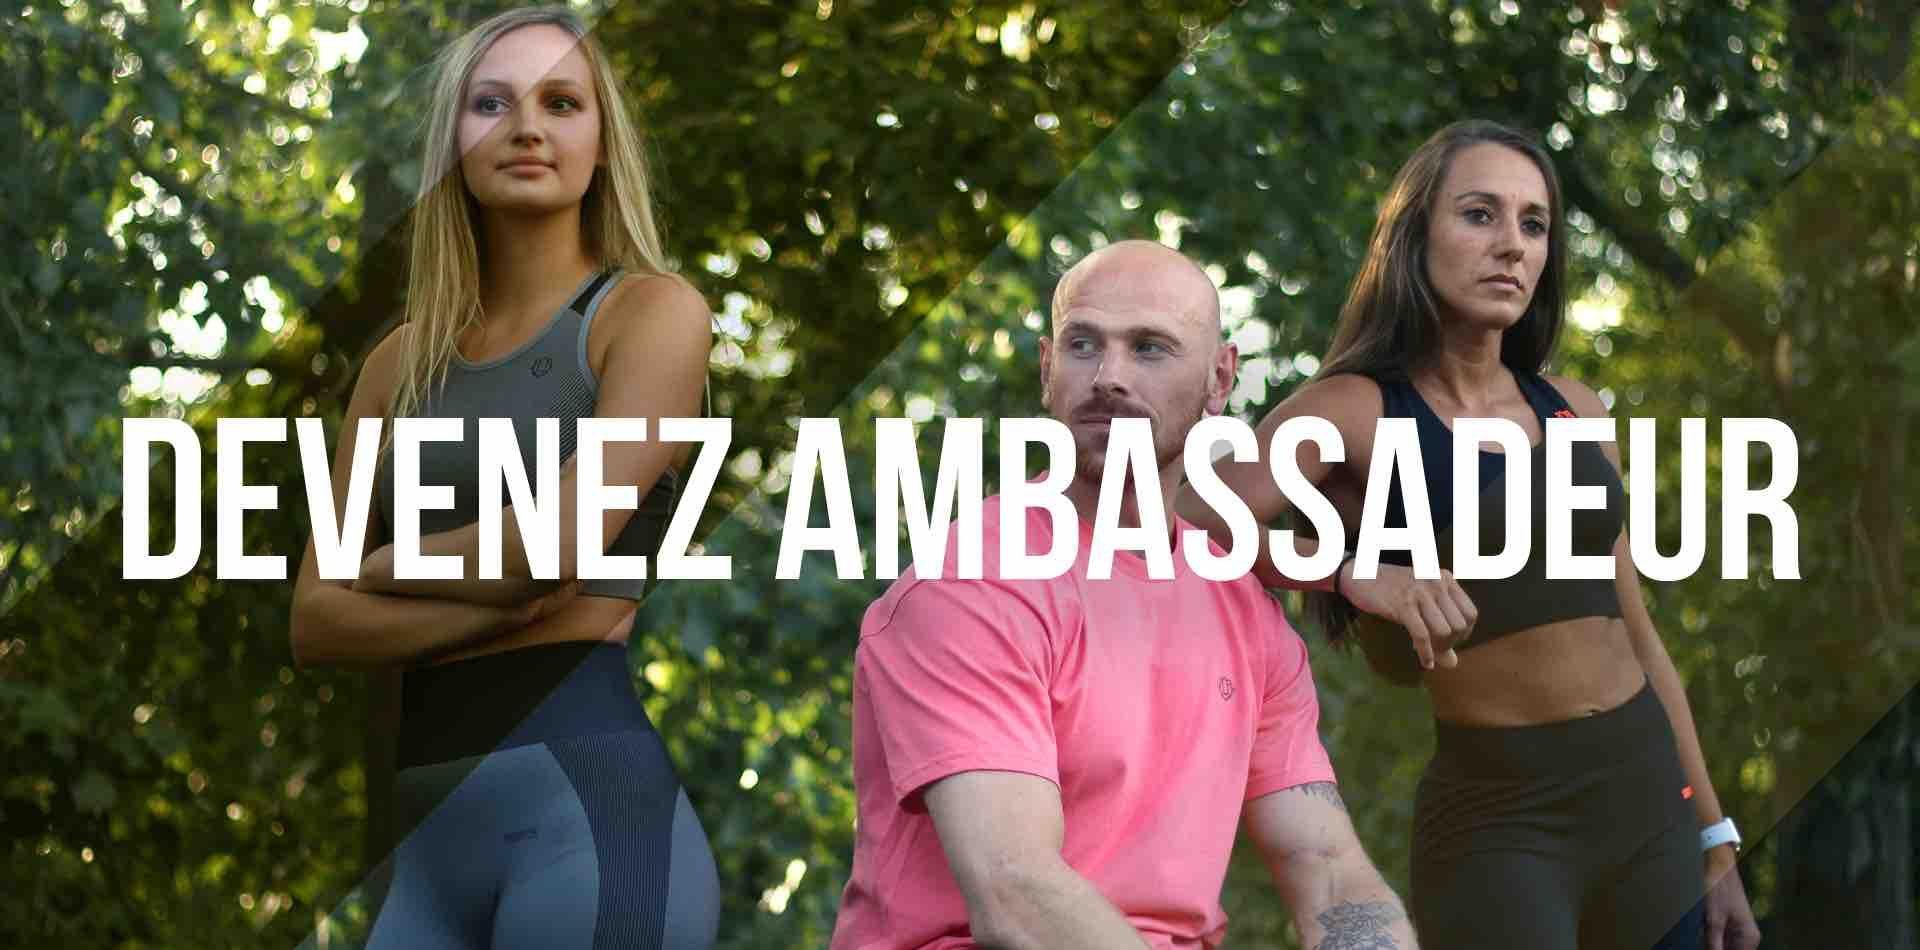 BANNIERE-AMBASSADEUR-UNIK